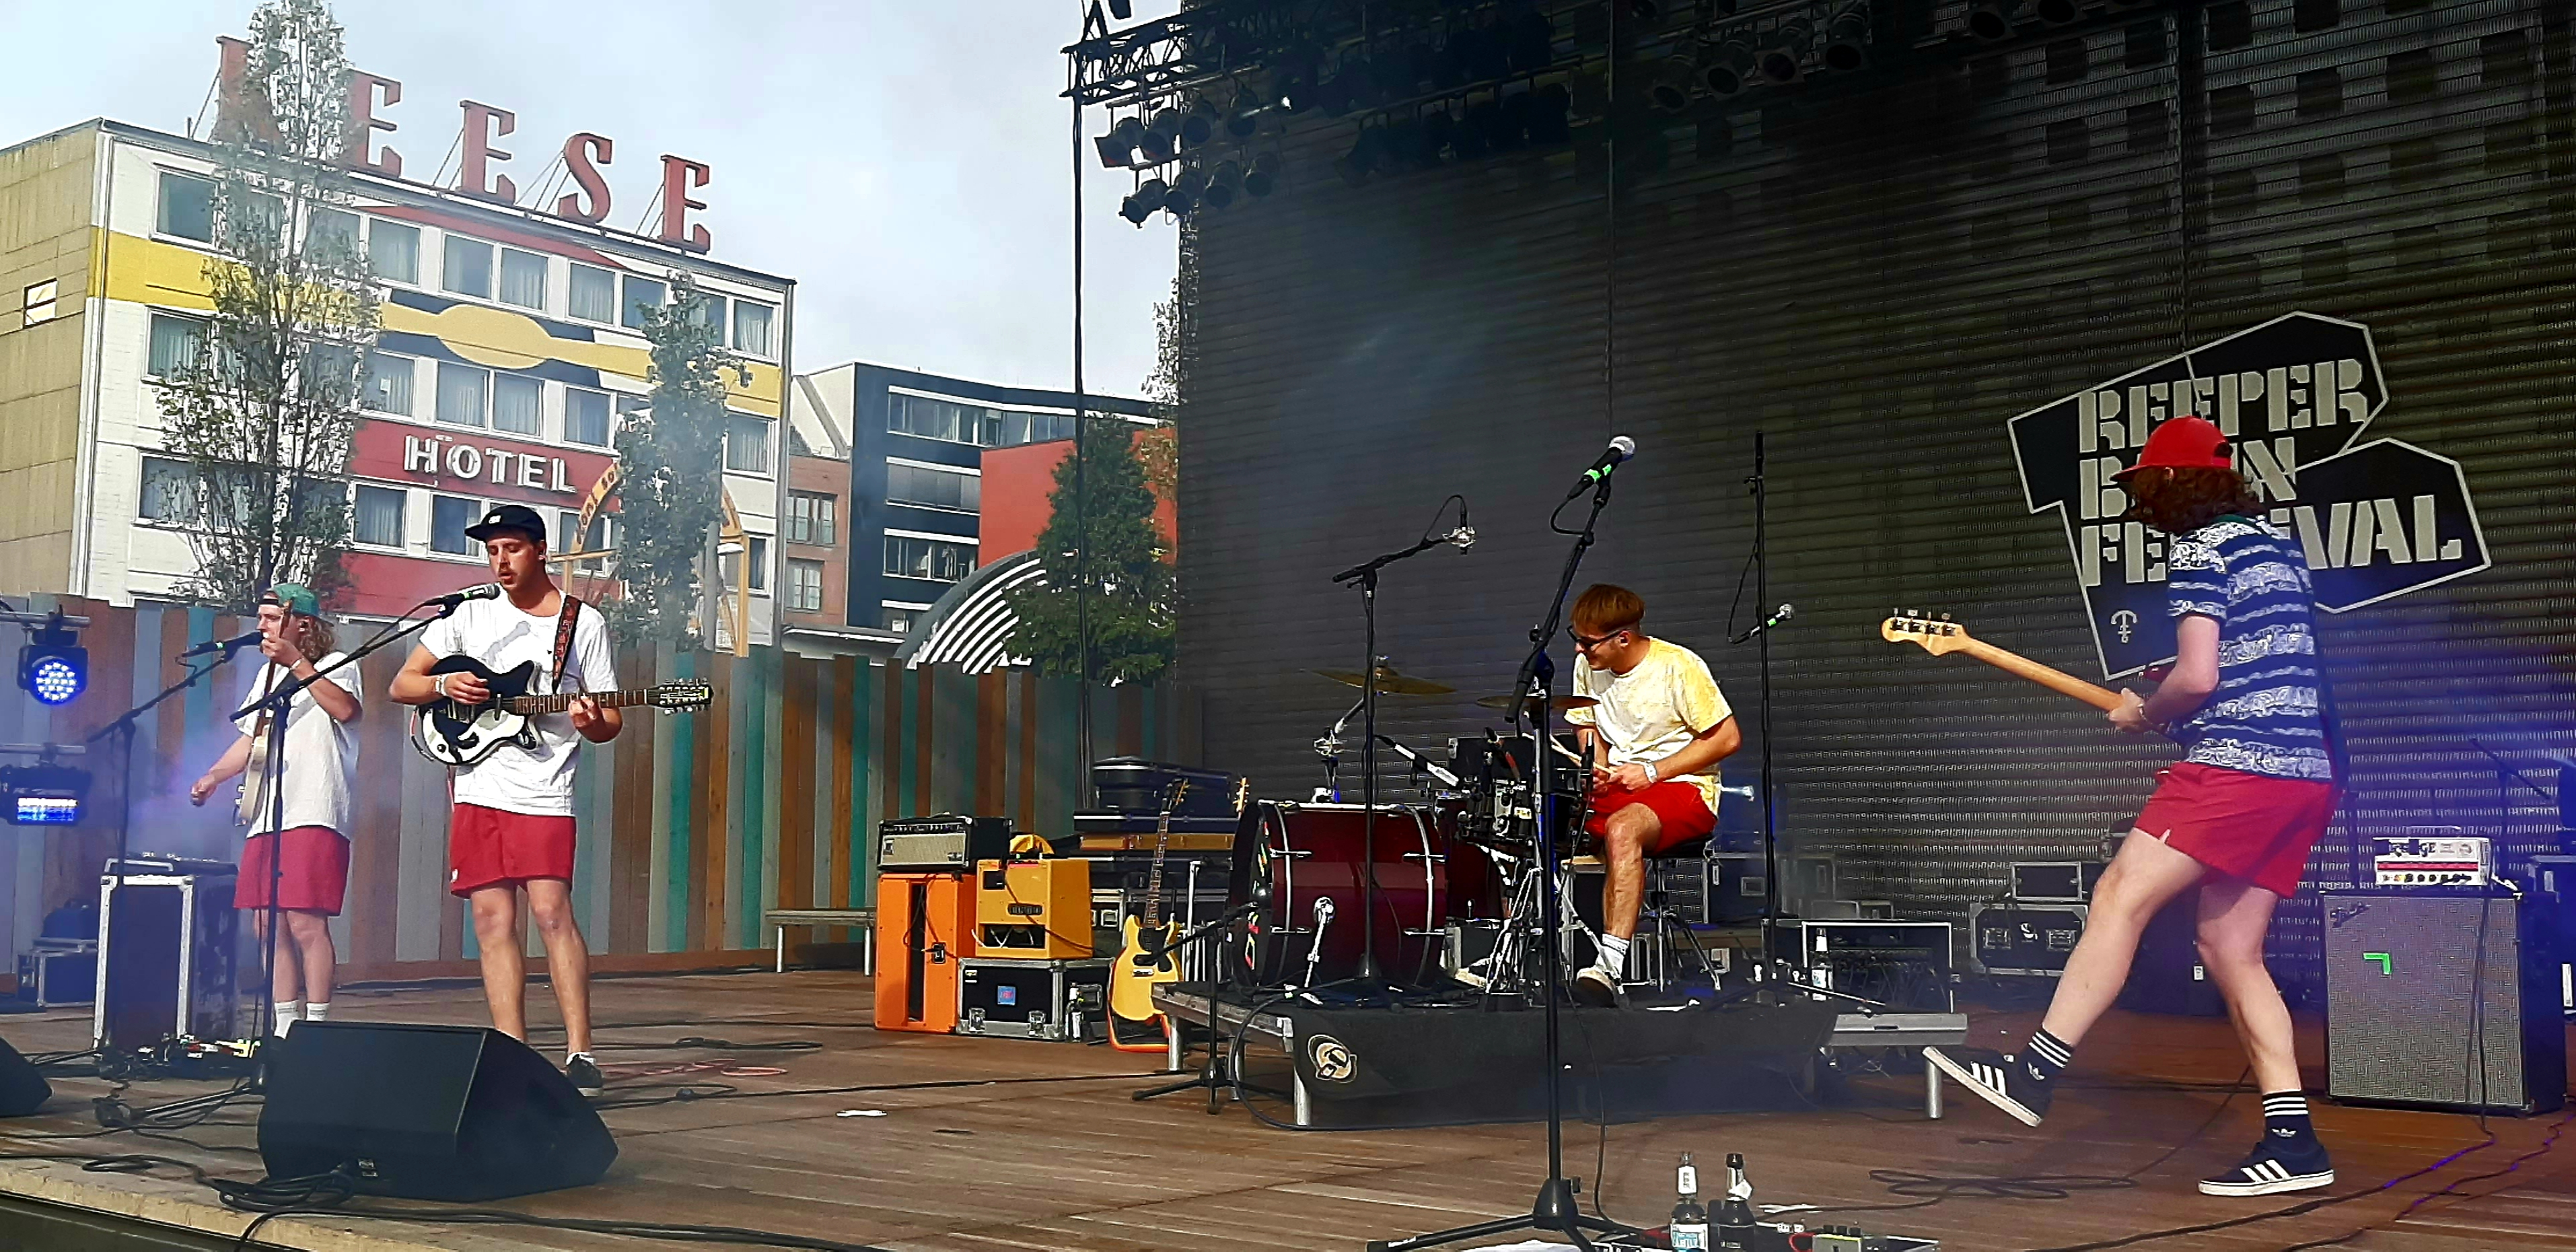 Reeperbahn Festival, Hamburg, St. Pauli, Tag 4, Fazit, Spielbudenplatz, Drens, Band, Dortmund